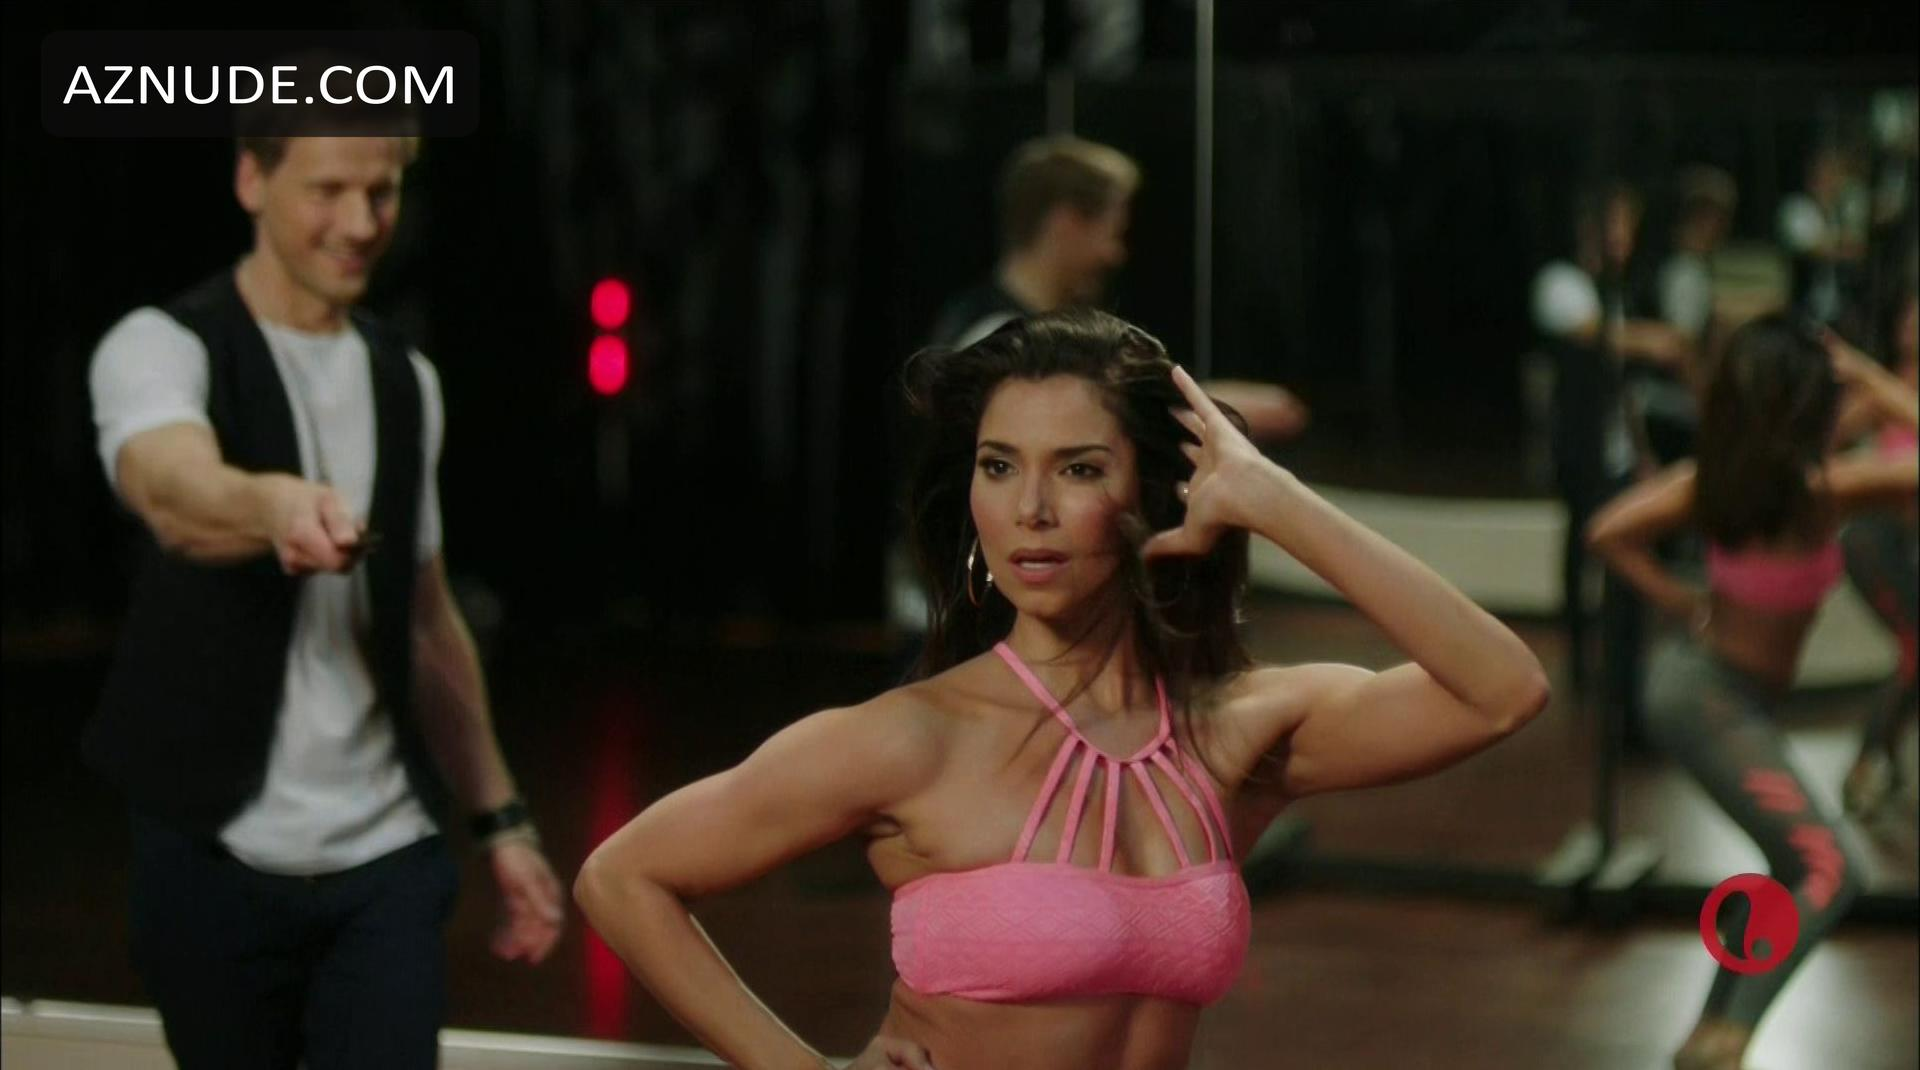 Fiona Vroom Naked death of a vegas showgirl nude scenes - aznude